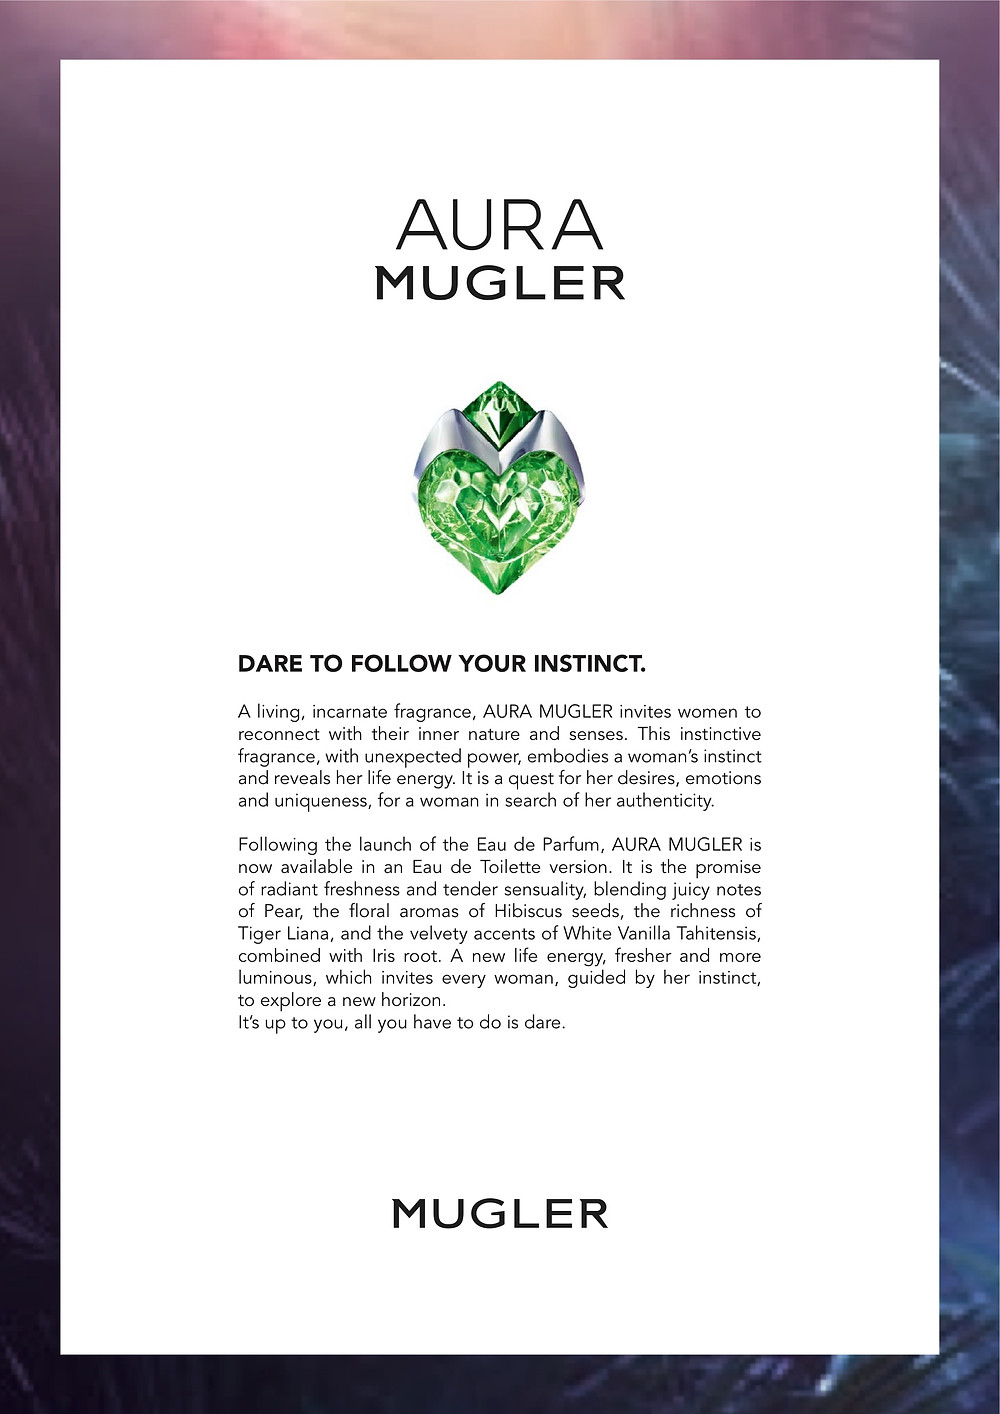 Aura Mugler, Dare To Follow Your Instinct | Susan Santora | Copywriter